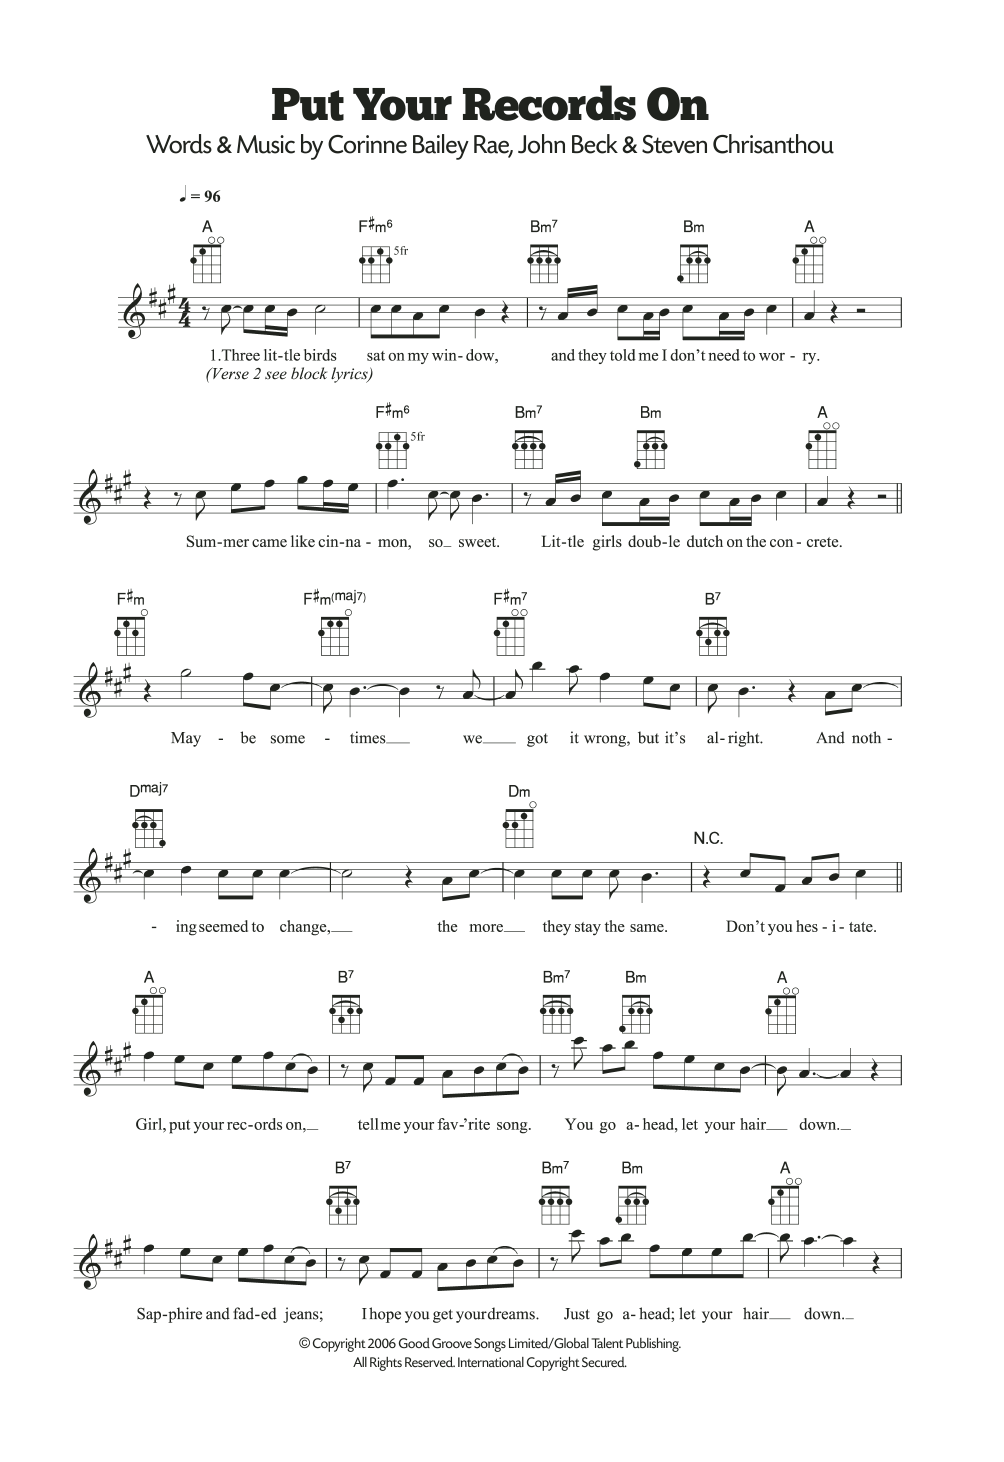 Sheet Music Digital Files To Print Licensed Corinne Bailey Rae